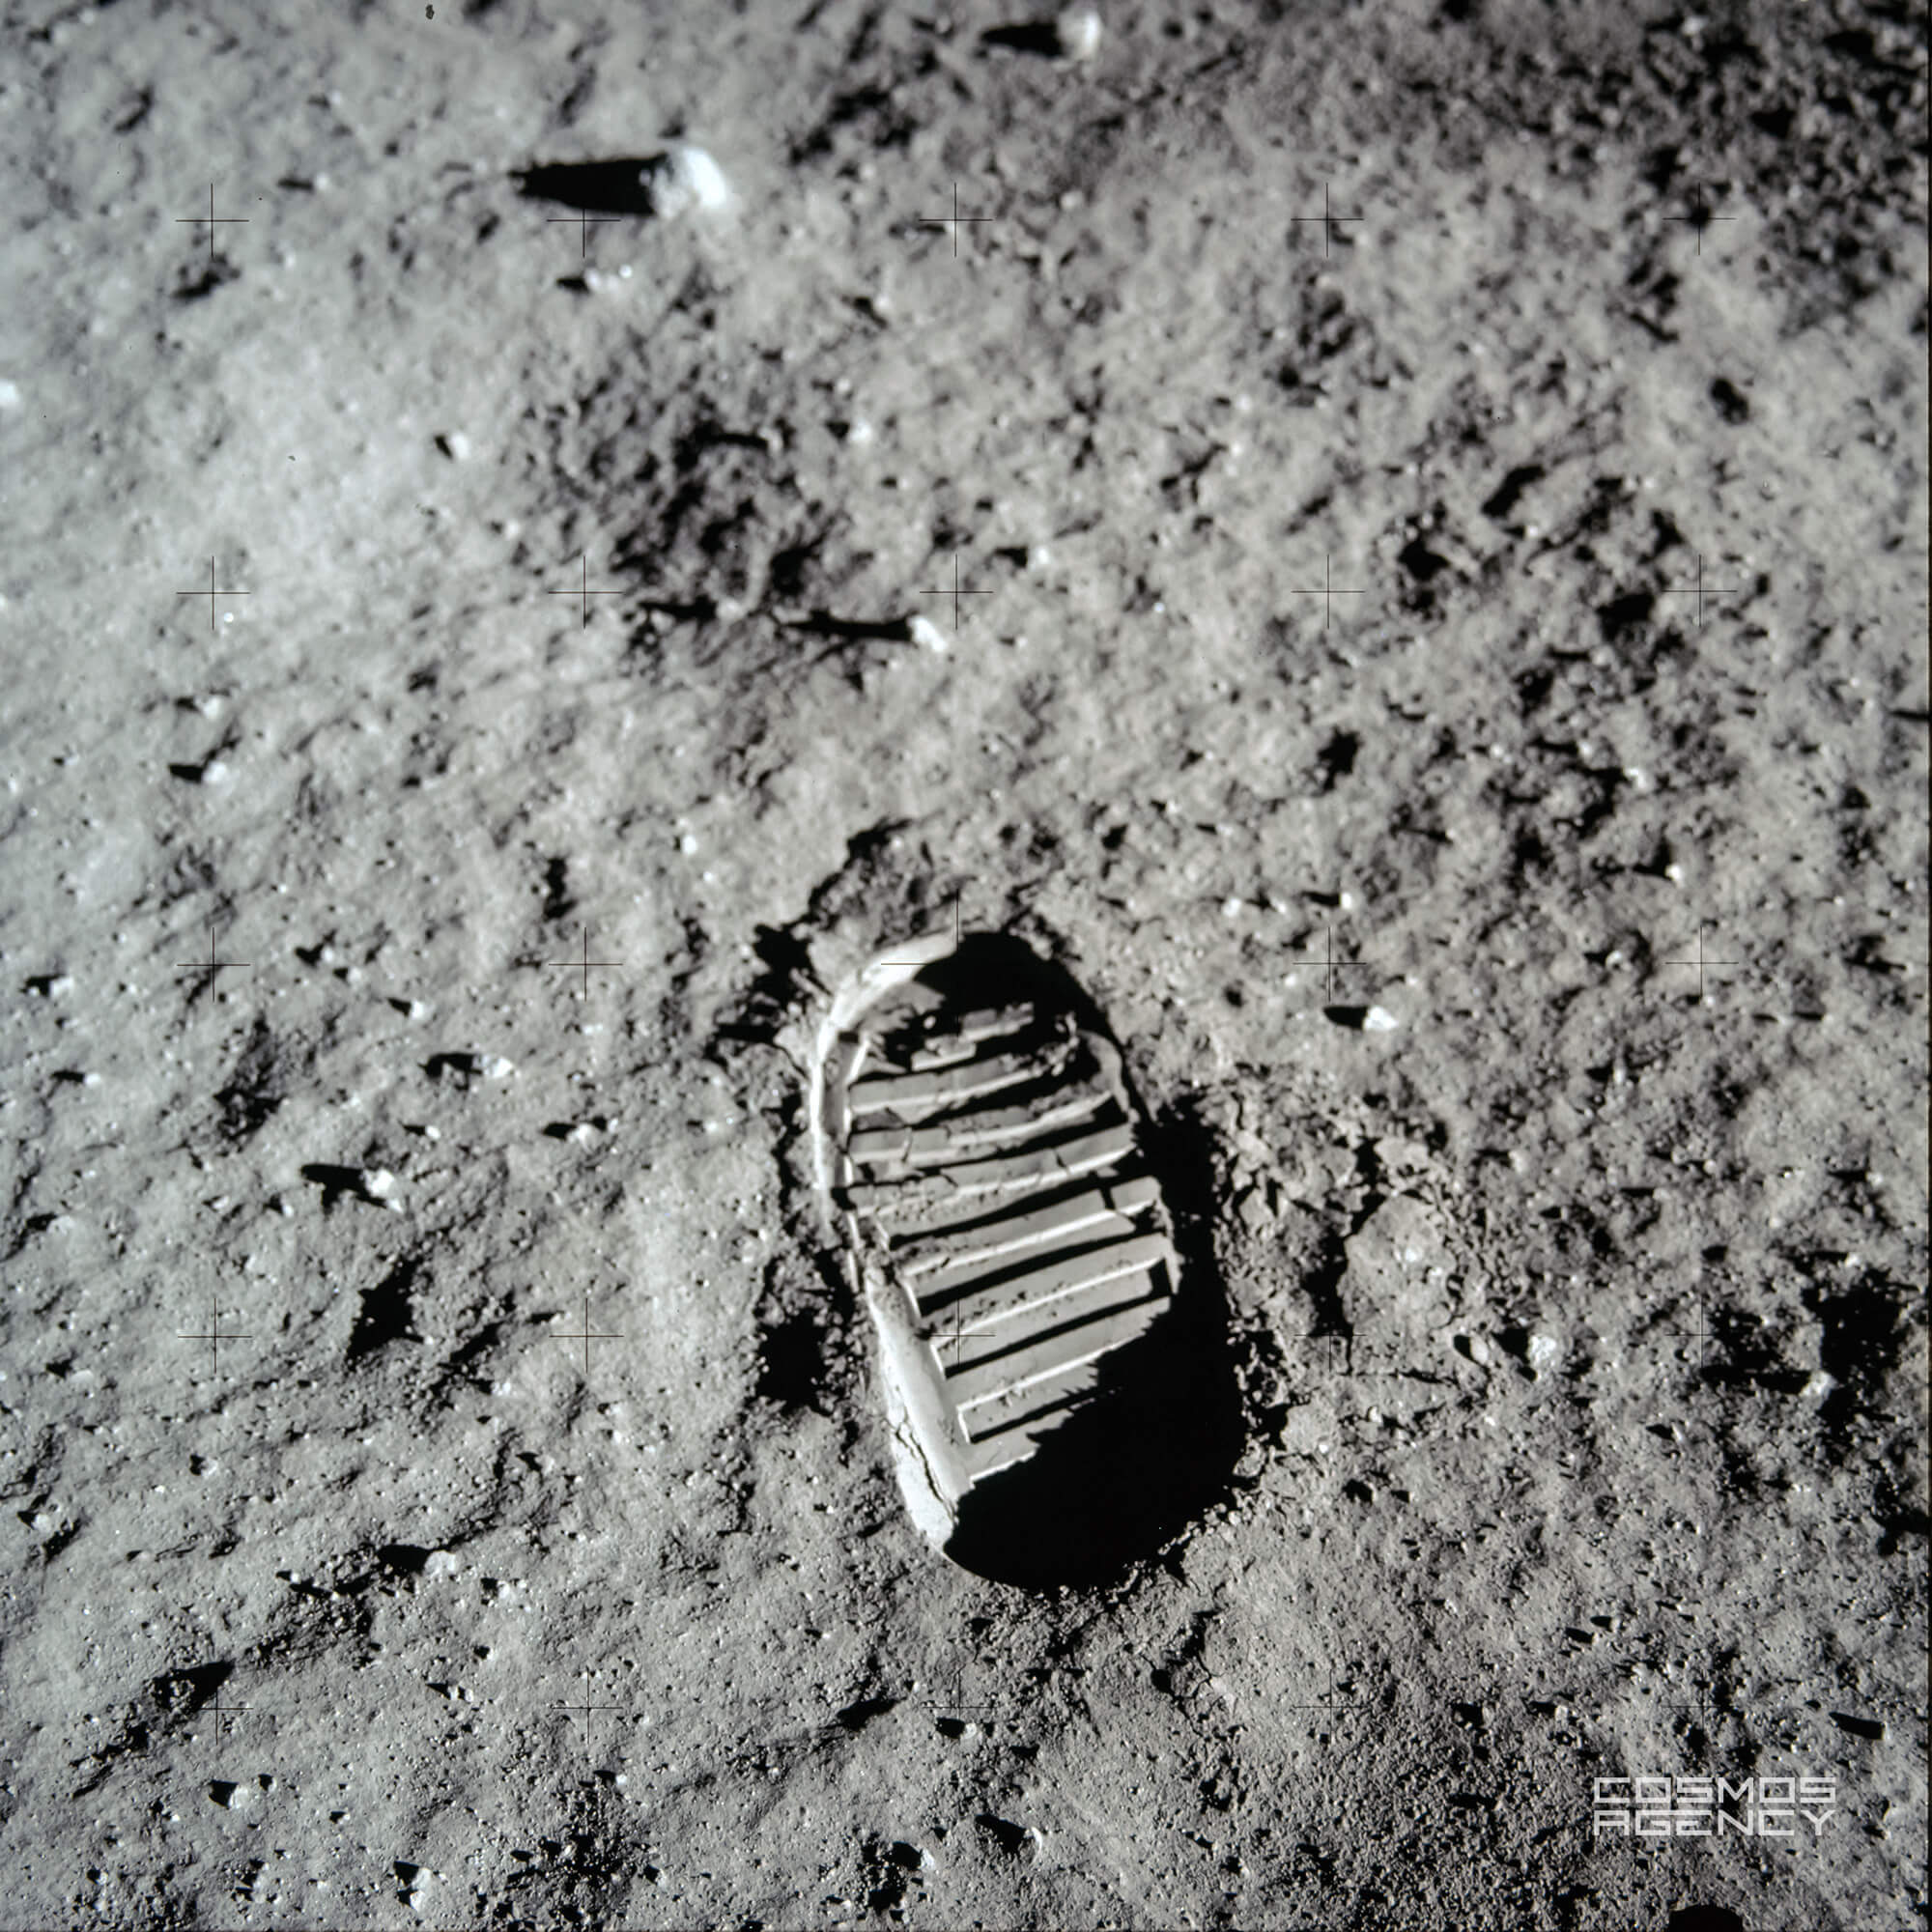 Знаменитый отпечаток на лунном грунте астронавта NASA Базза Олдрина, Аполлон 11